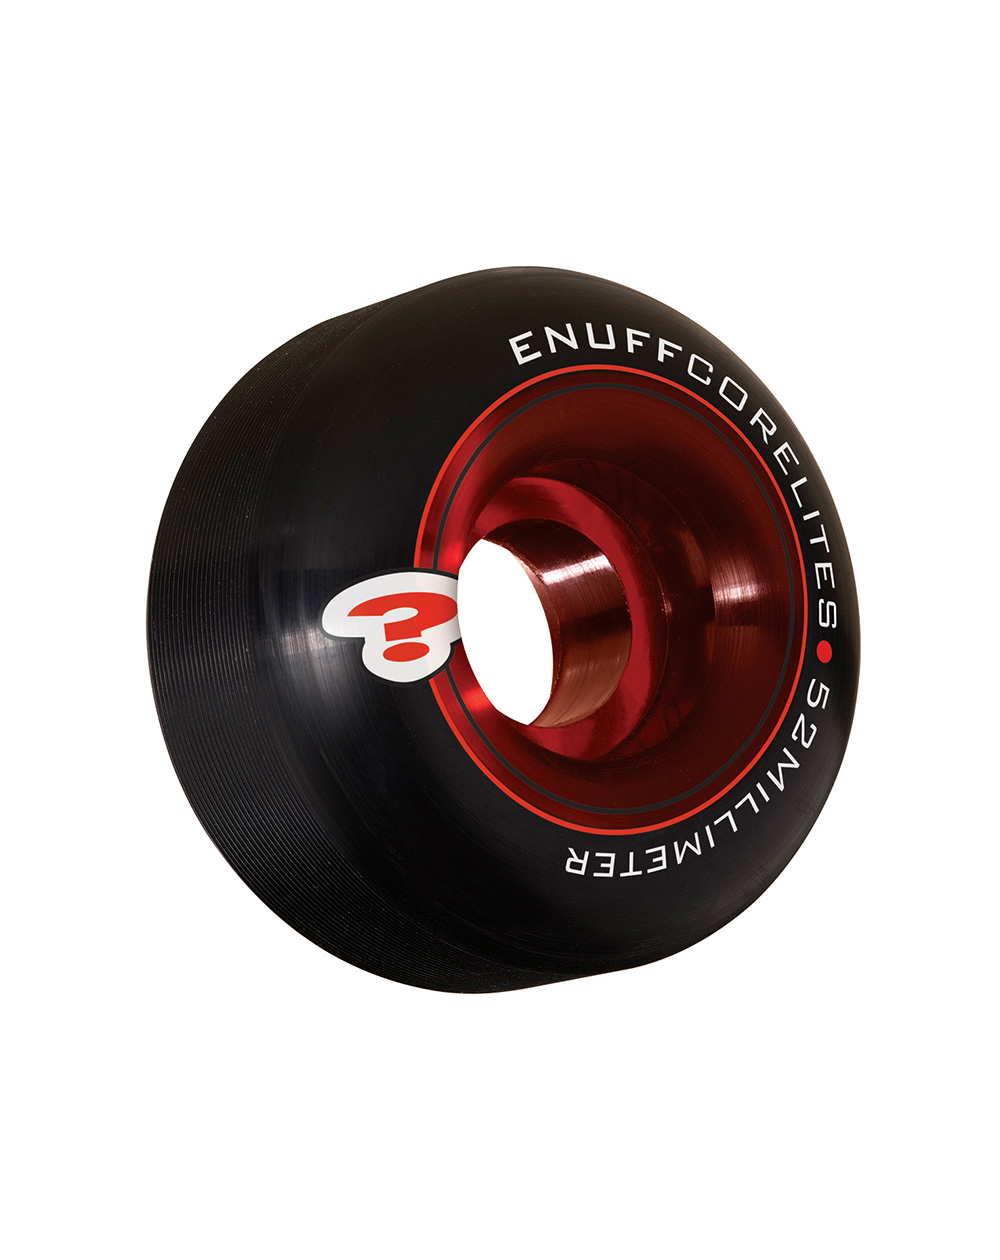 Enuff Roues Skateboard Corelites 52mm Black/Red 4 pc